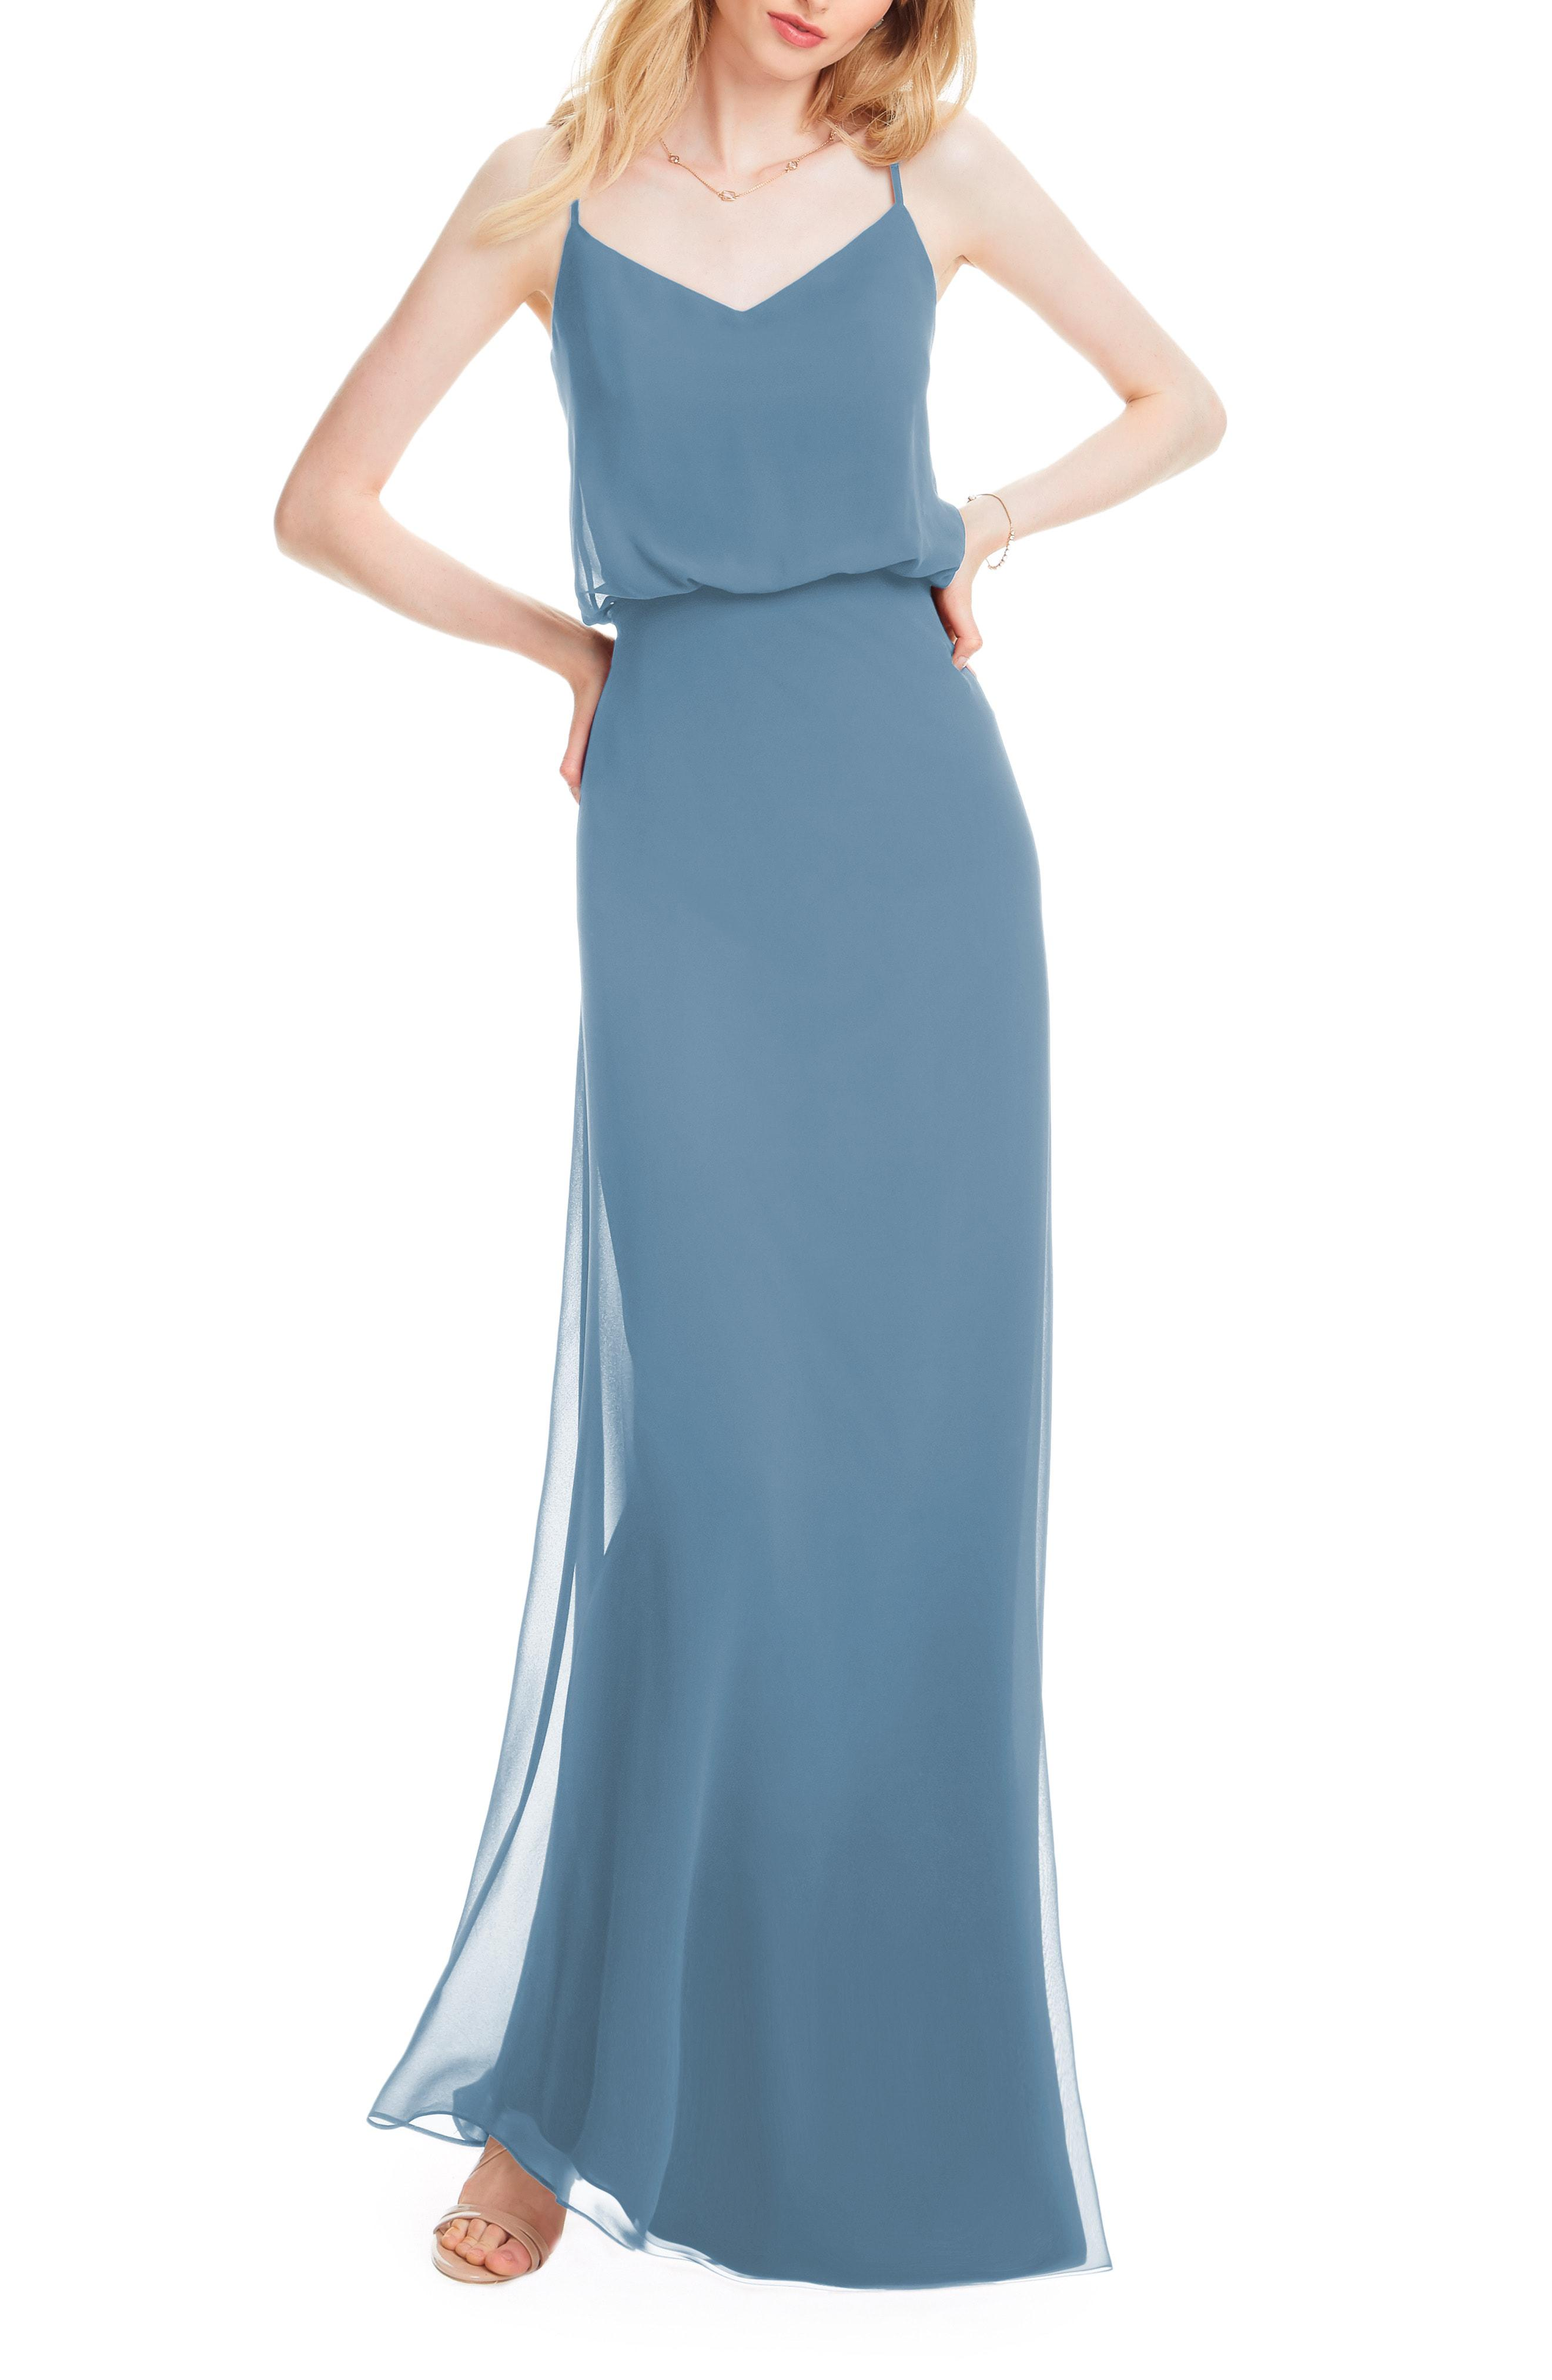 05e47531a0 Bill Levkoff. Women s Blue   Spaghetti Strap Chiffon Gown